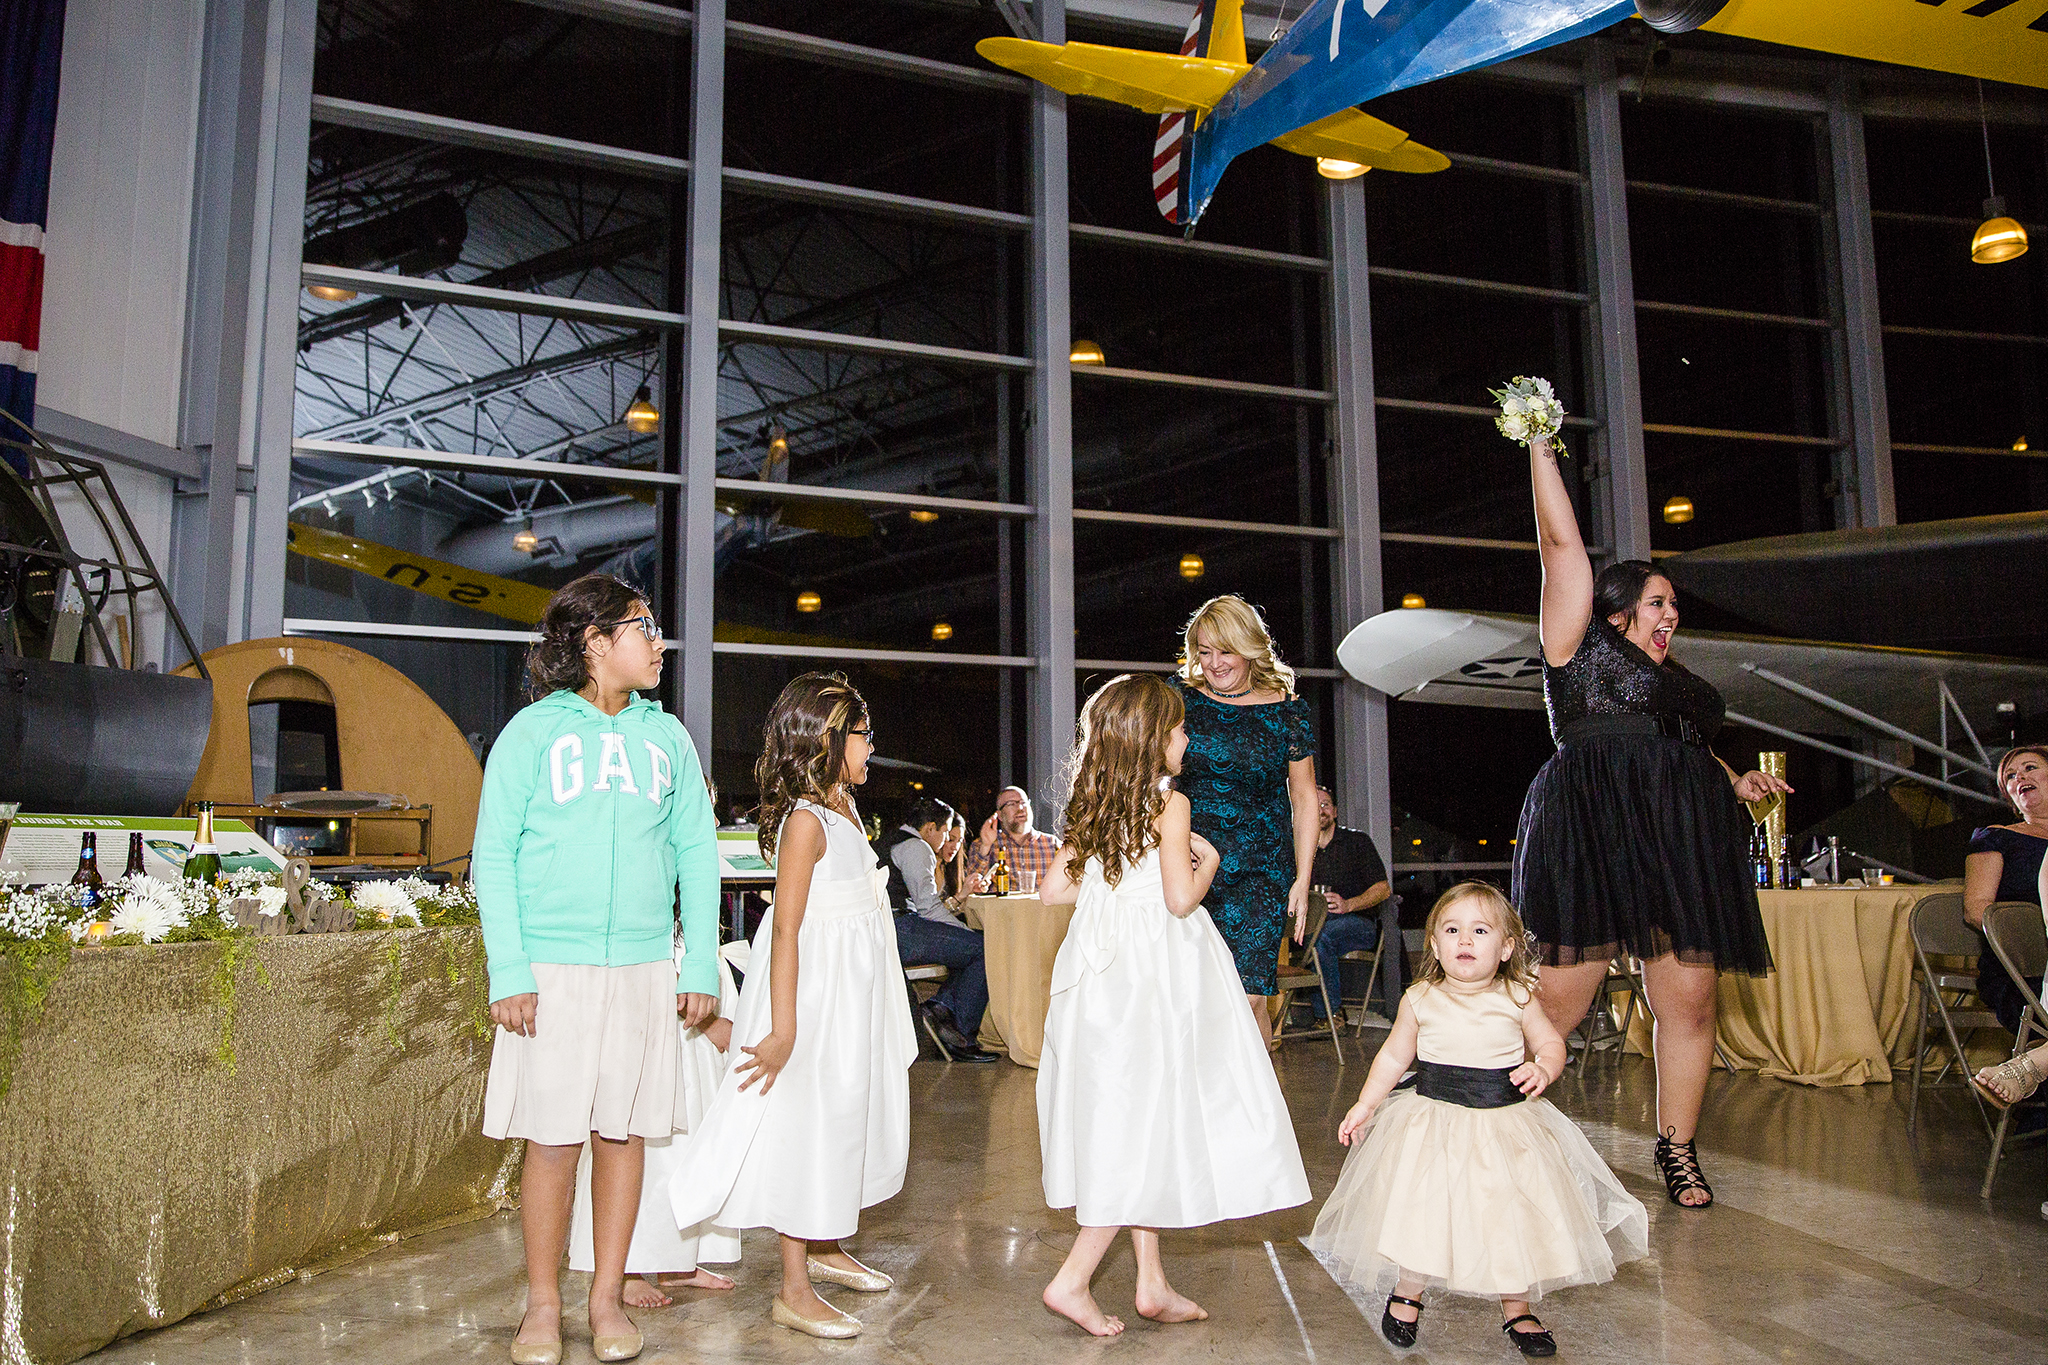 bouquet toss, single ladies, wedding reception